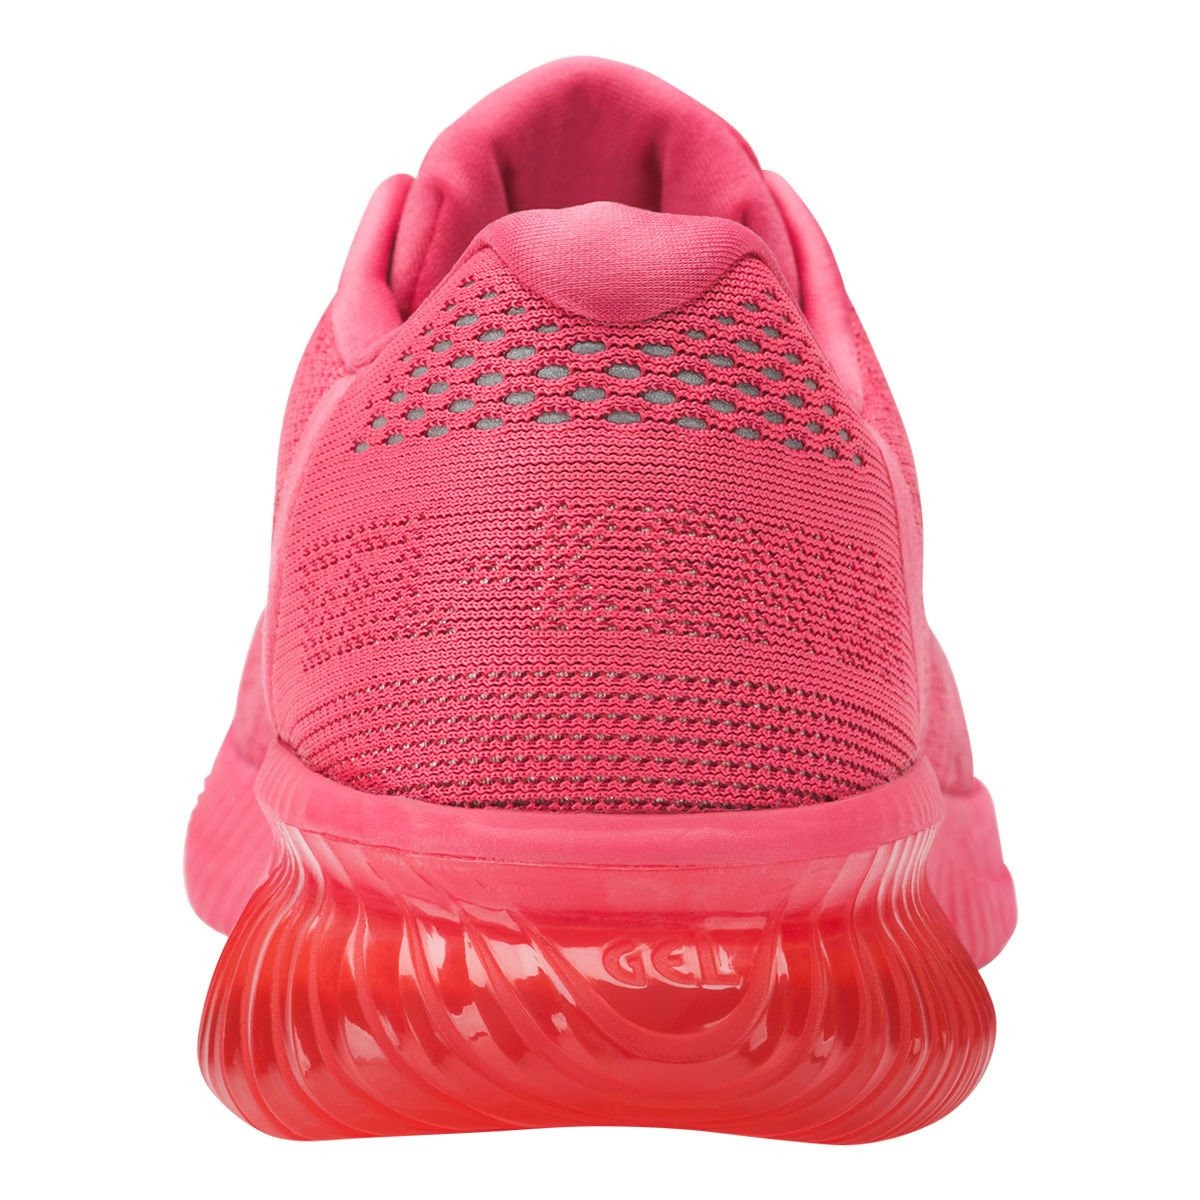 Carregando zoom... tênis asics gel kenun feminino rosa 2caf5fa64413a